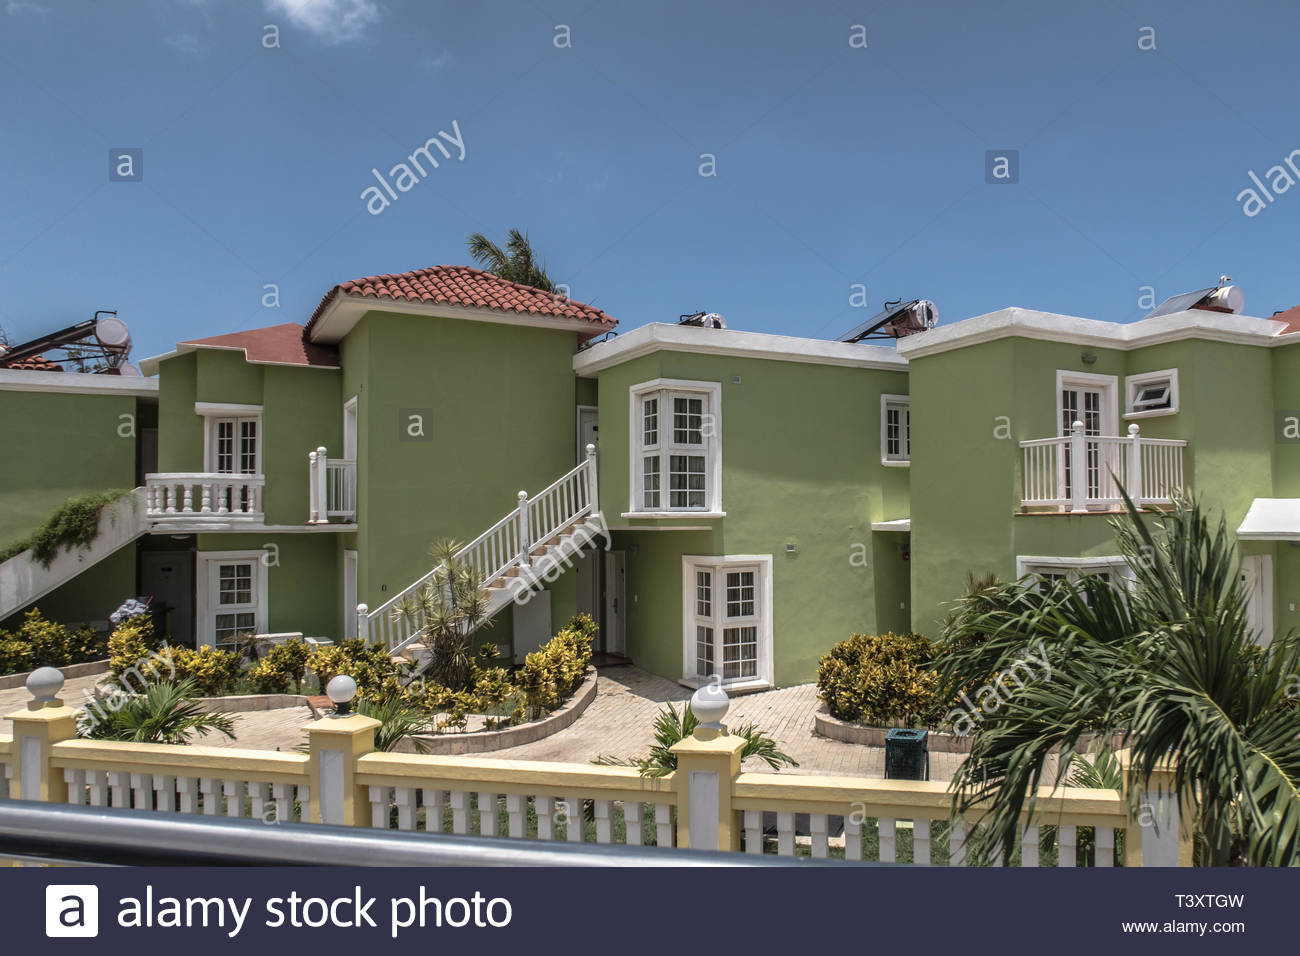 May 2017, Havana, Cuba. Residential neighbourhoods for the emerging middle class are slowly emerging in Havana. Mai 2017, La Havane, Cuba. Des quartie - Stock Image